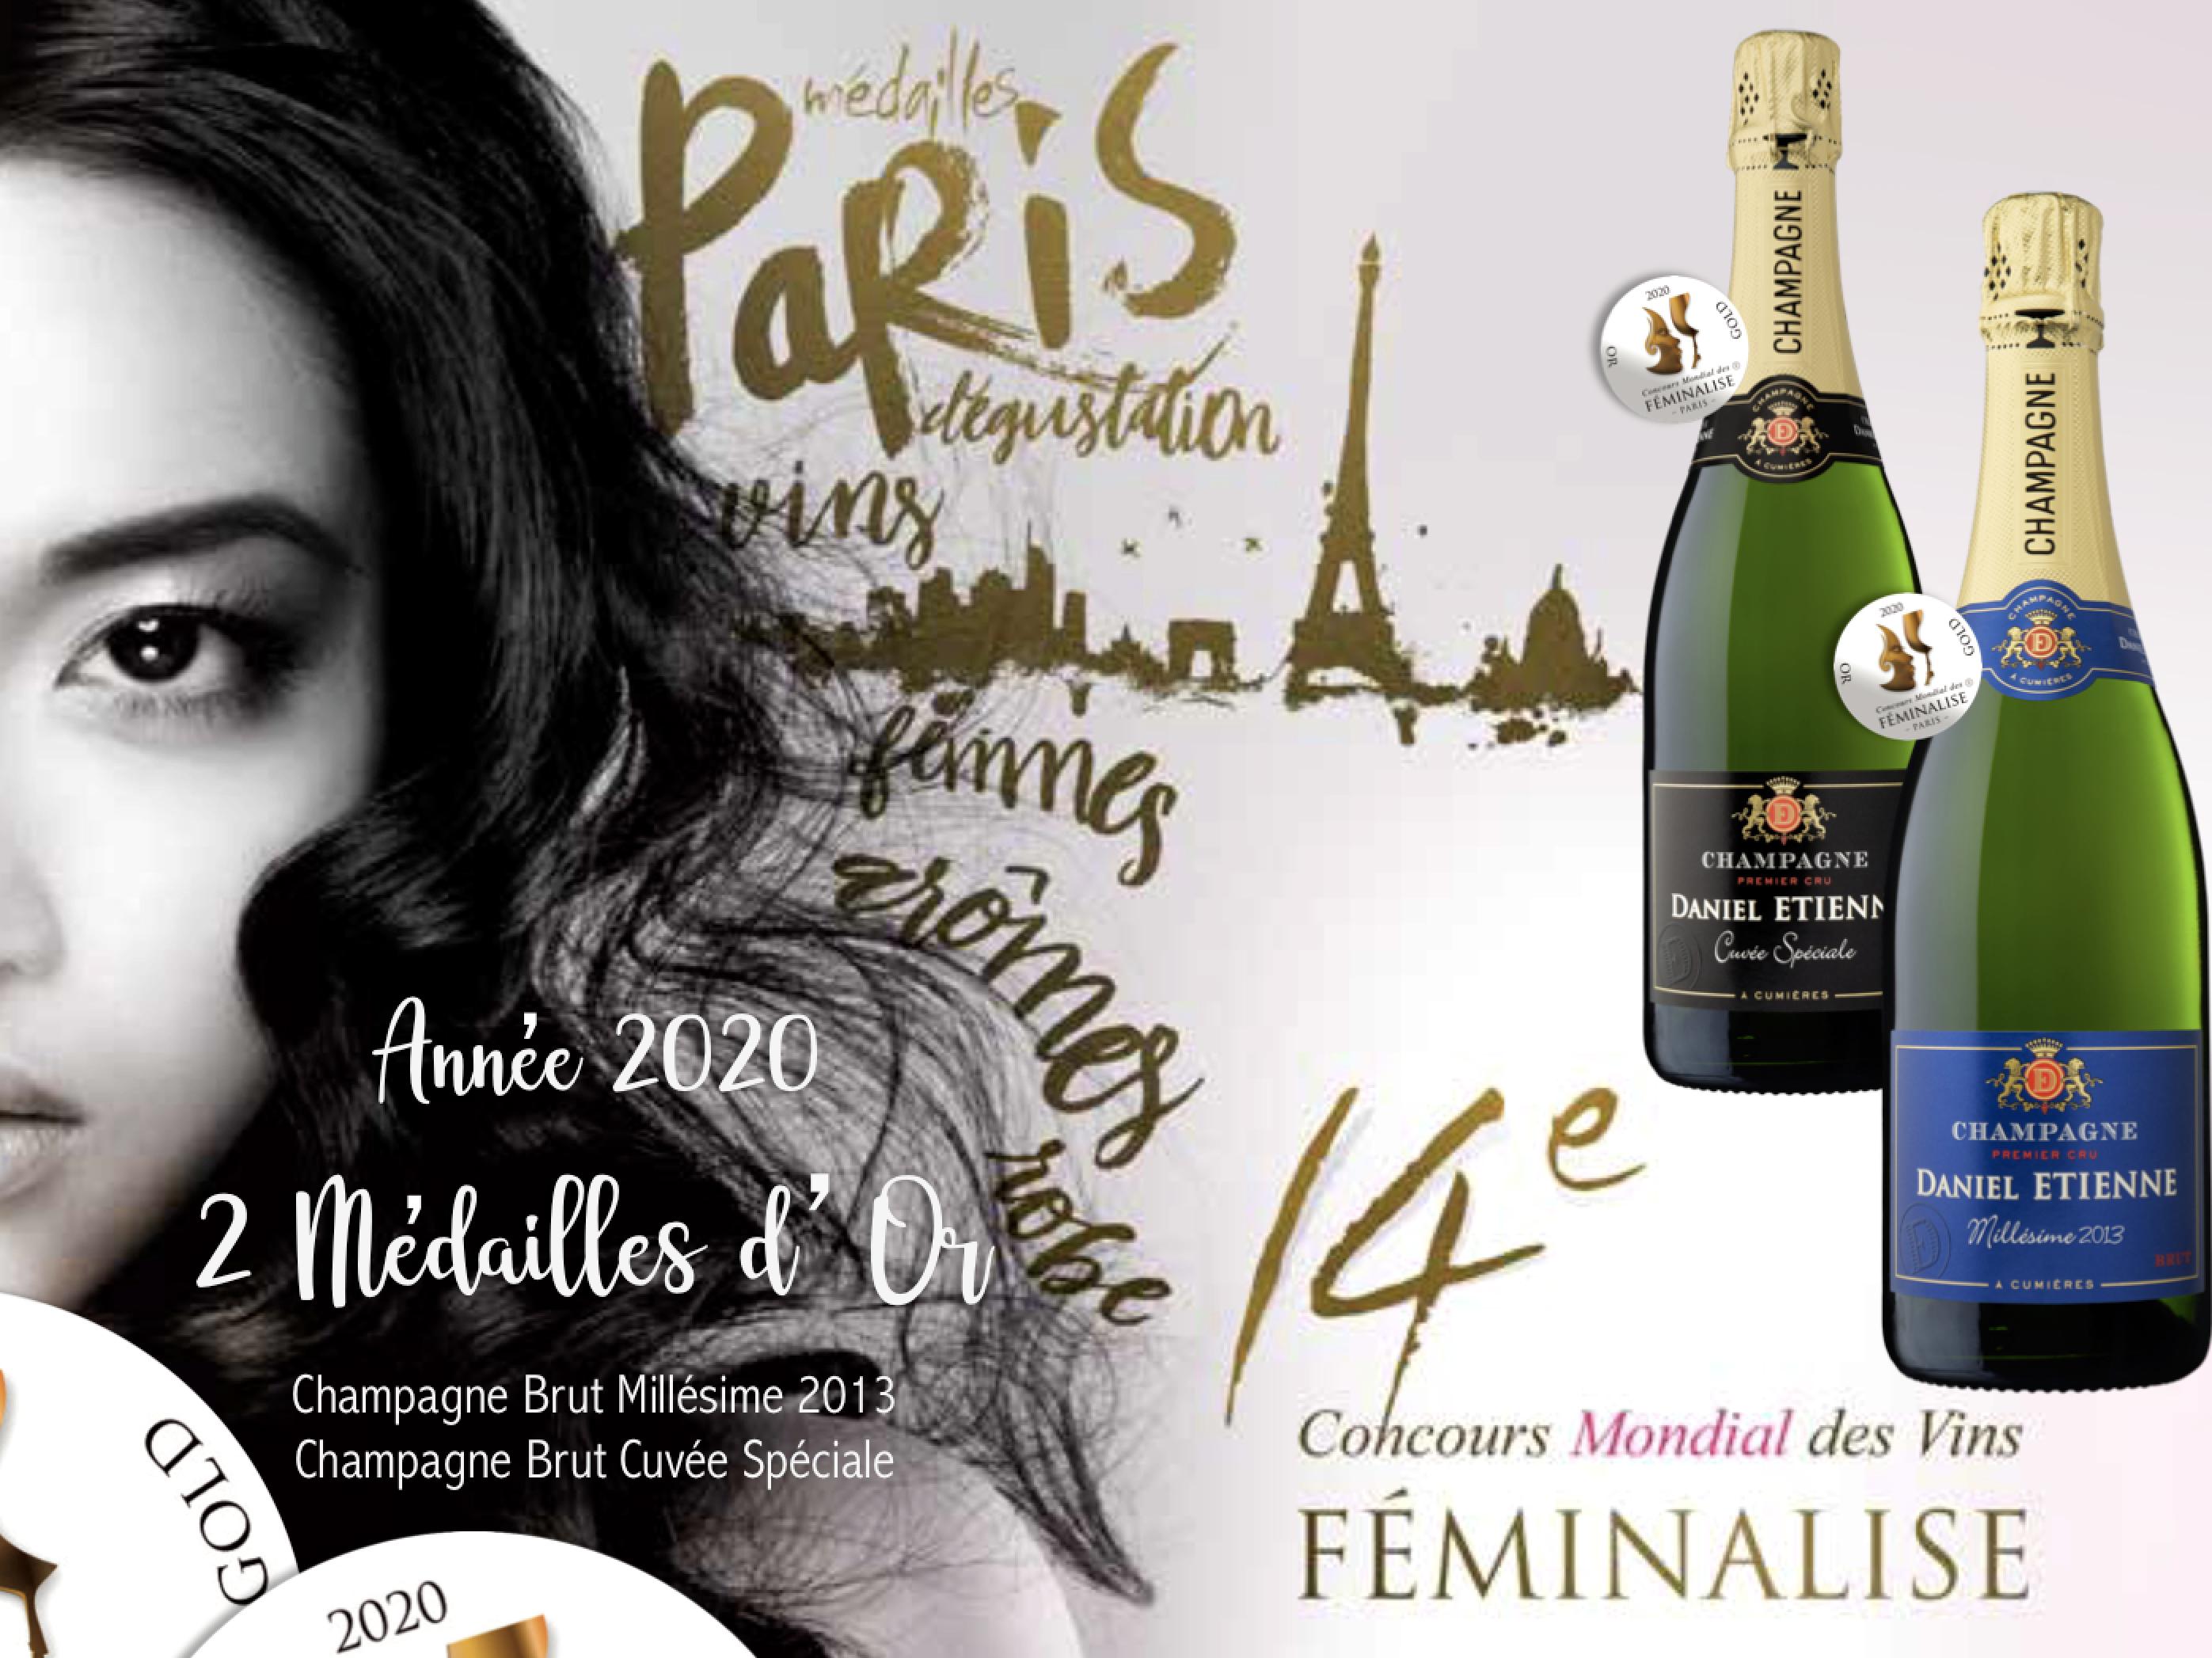 MEDAILLES FEMINALISE 2020 OR